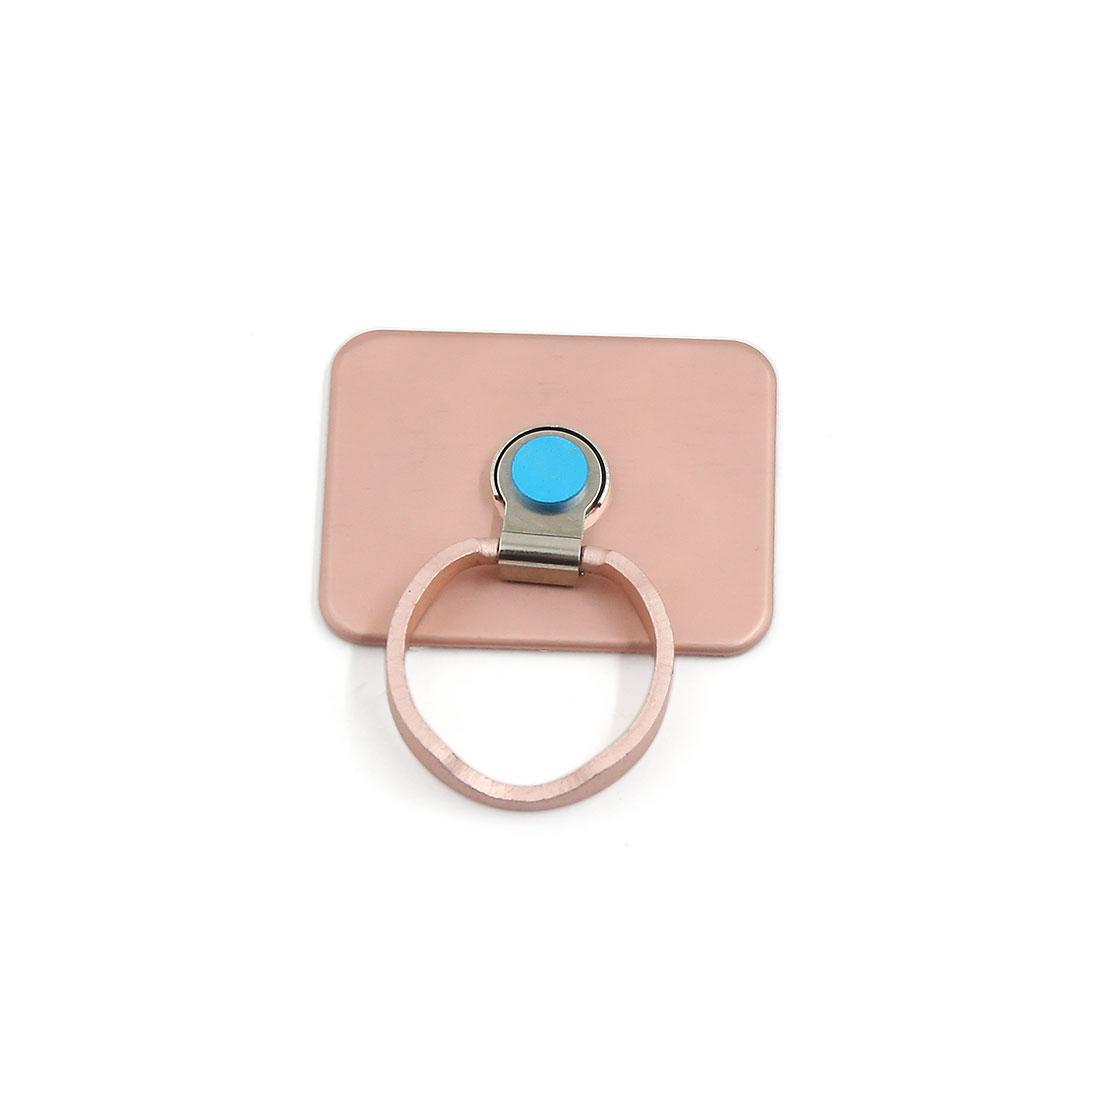 Universal Mobilephone Smart Phone Metal Ring Stent Holder Finger Grip Pink